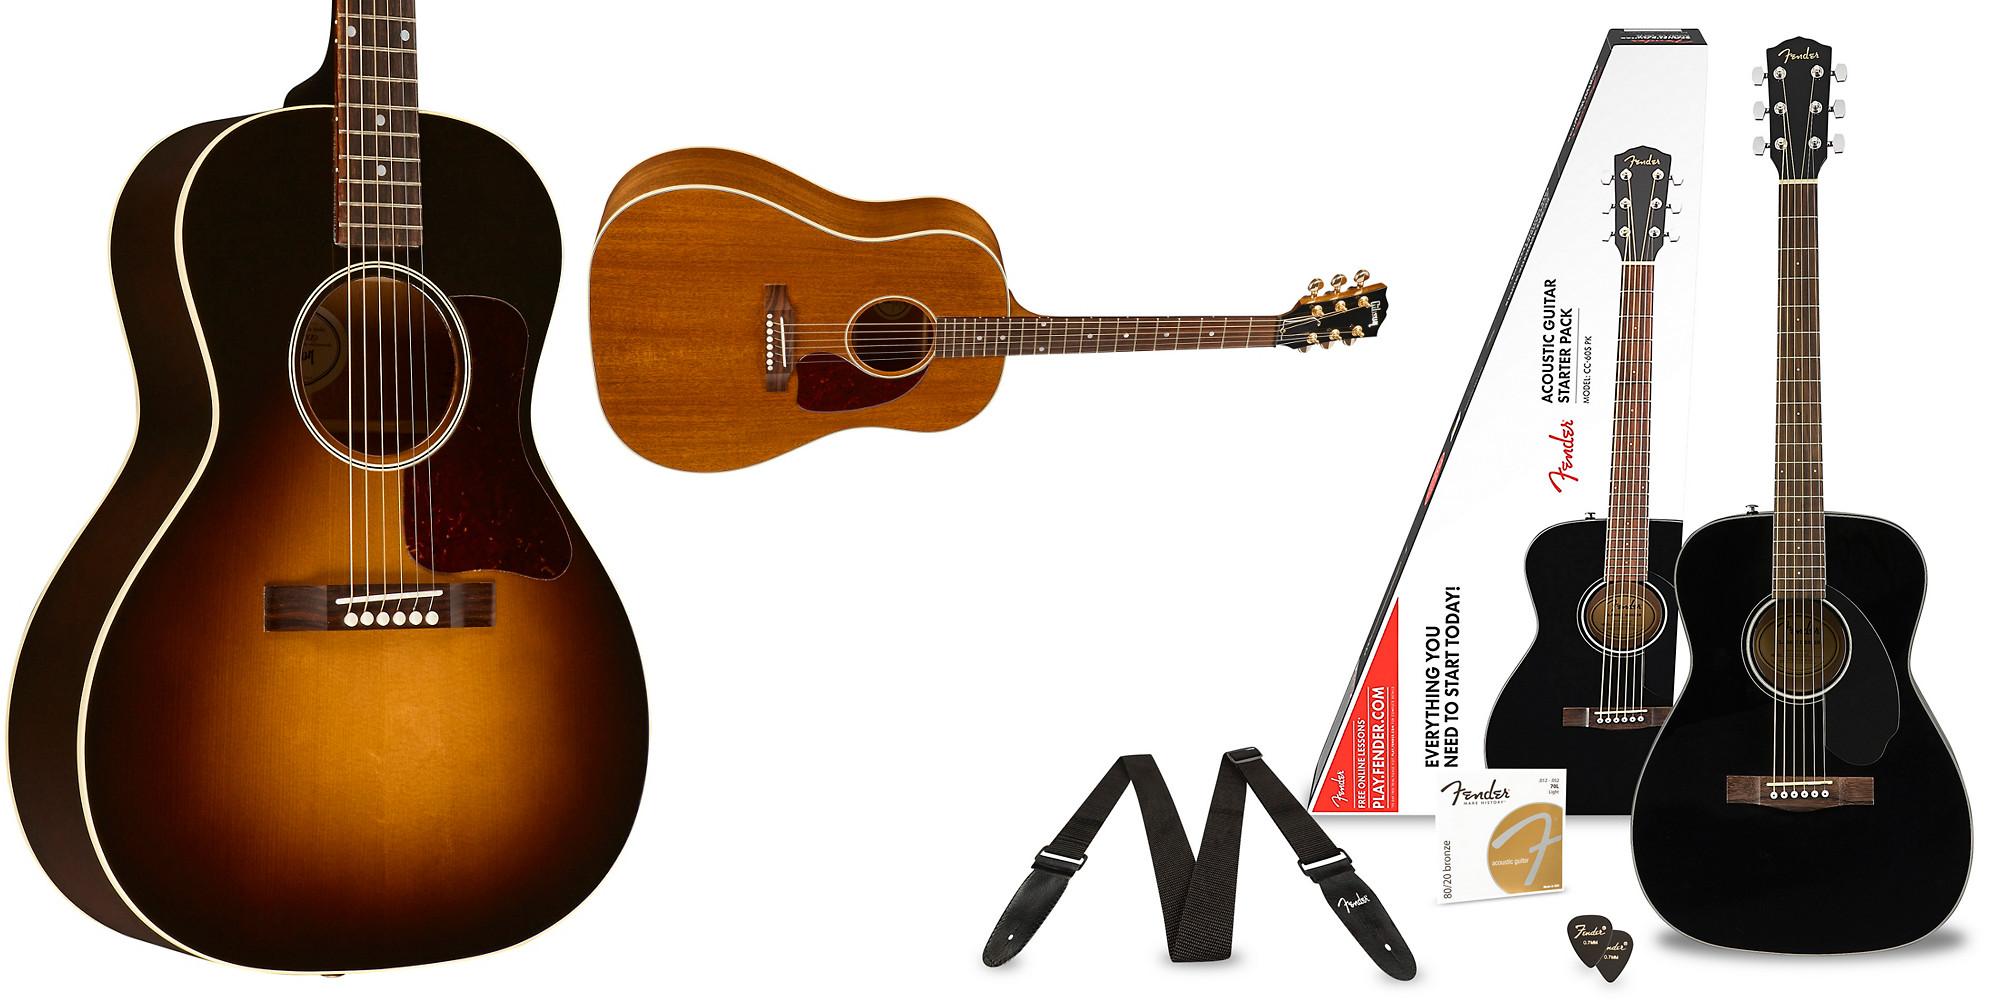 guitar sale up to 290 off fender bundle gibson j 45 more from 120 9to5toys. Black Bedroom Furniture Sets. Home Design Ideas